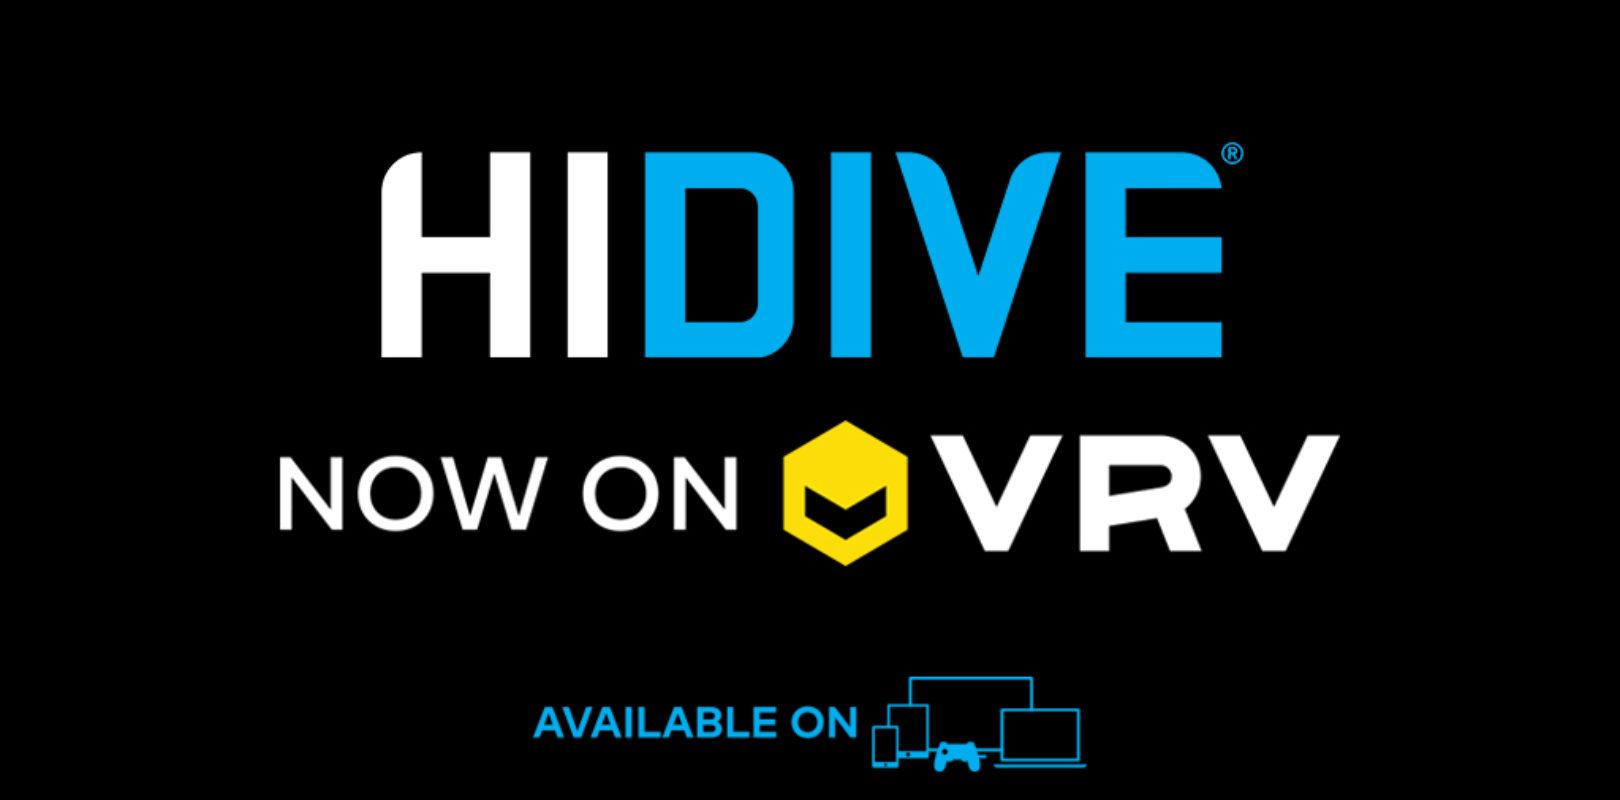 VRV Gets HIDIVE as Newest Channel Partner - The Geek Lyfe